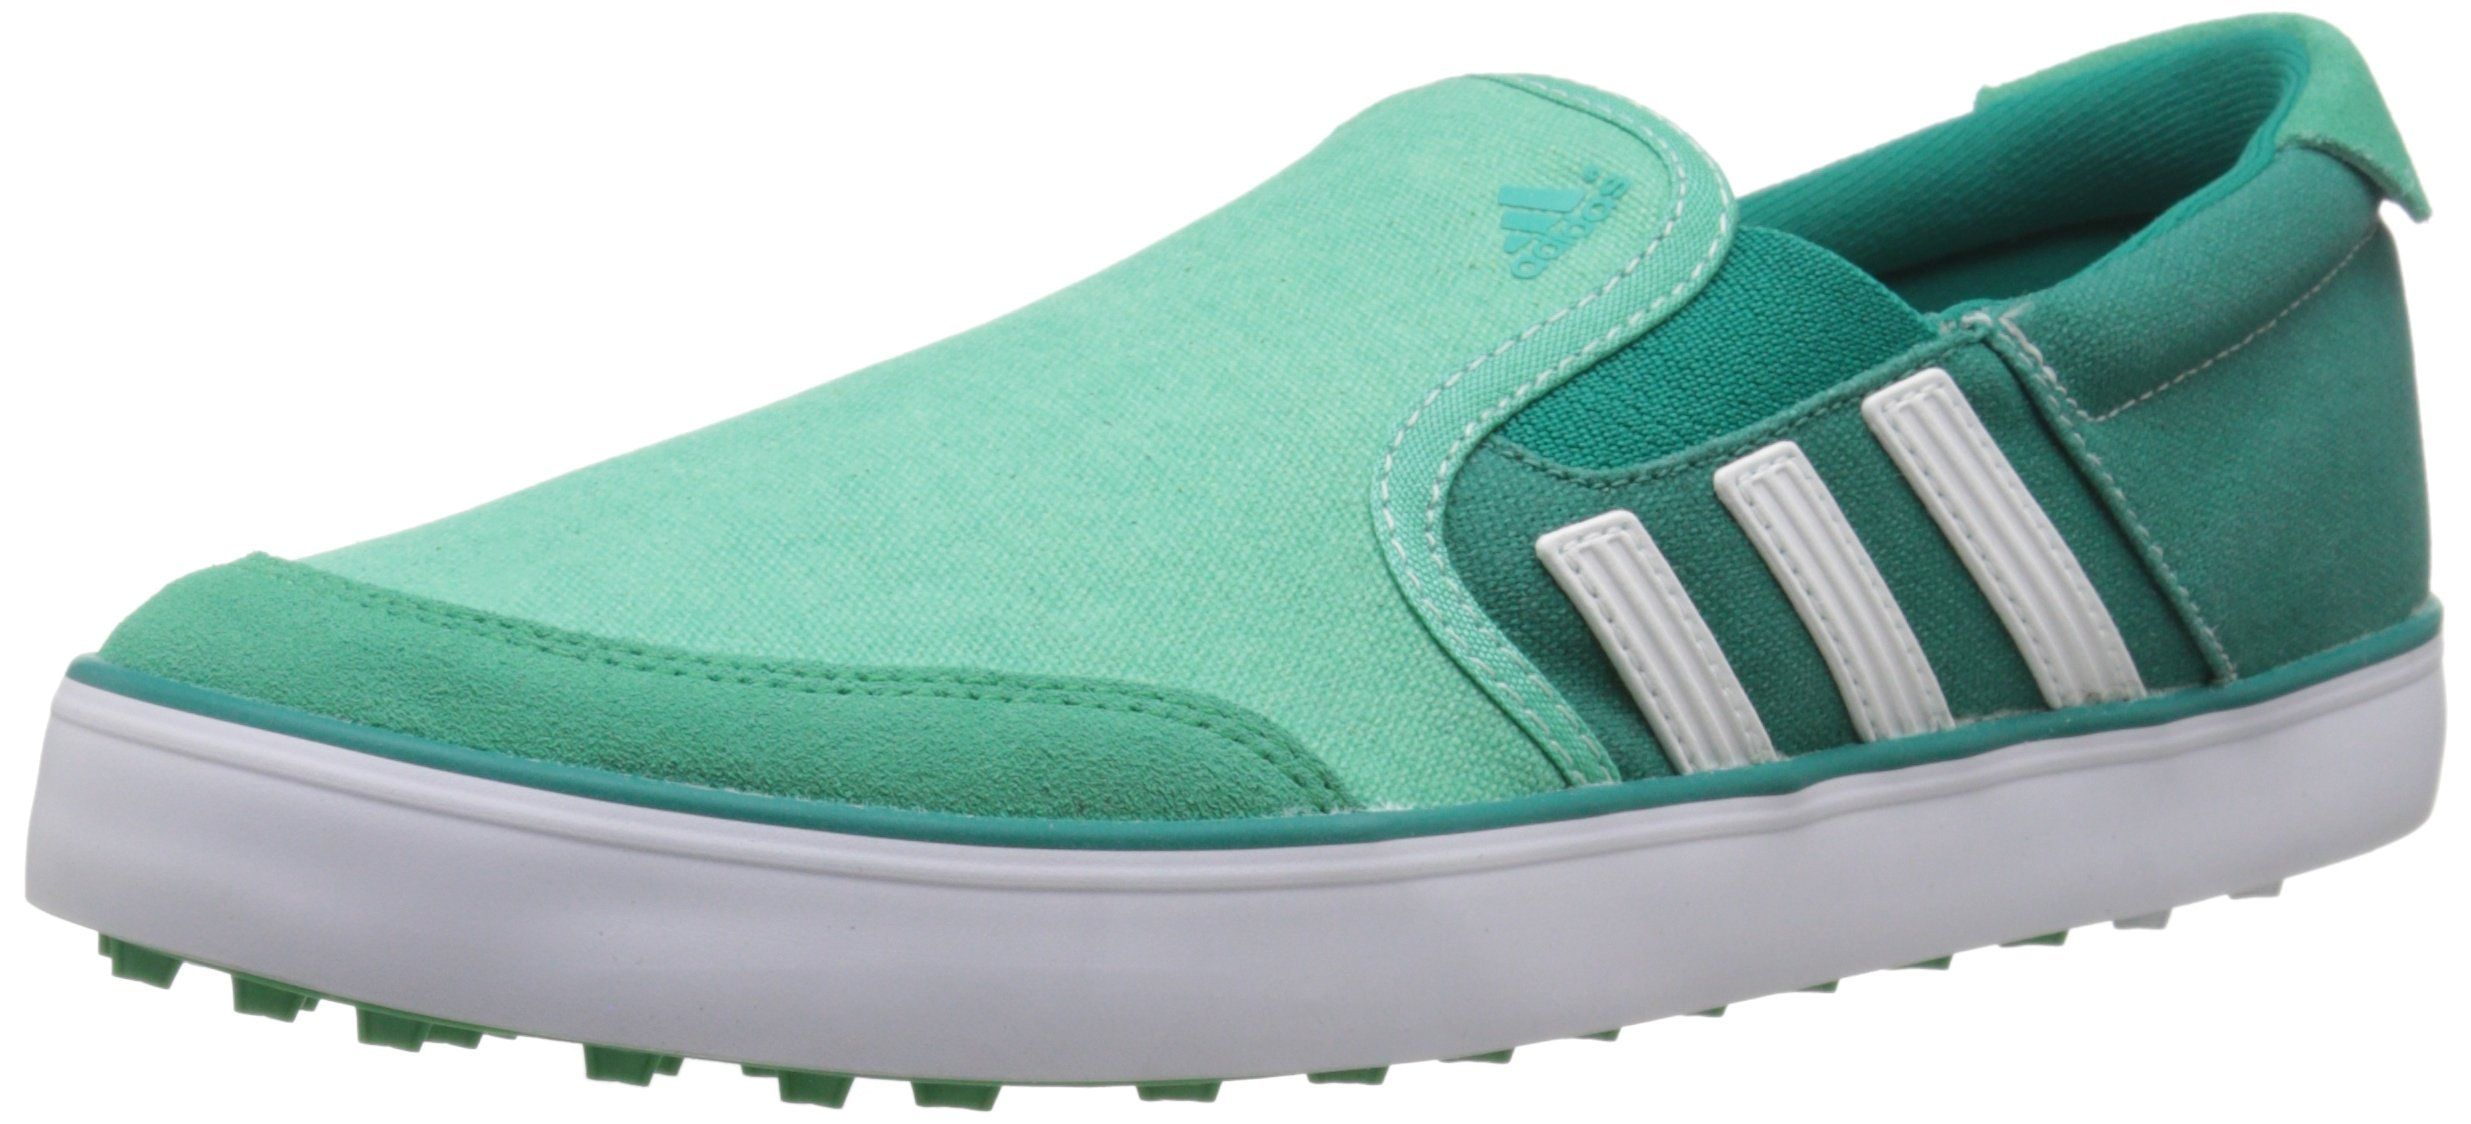 Best Mens Golf Shoes - Adidas Adicross Sl Bright Green/White/Power Green